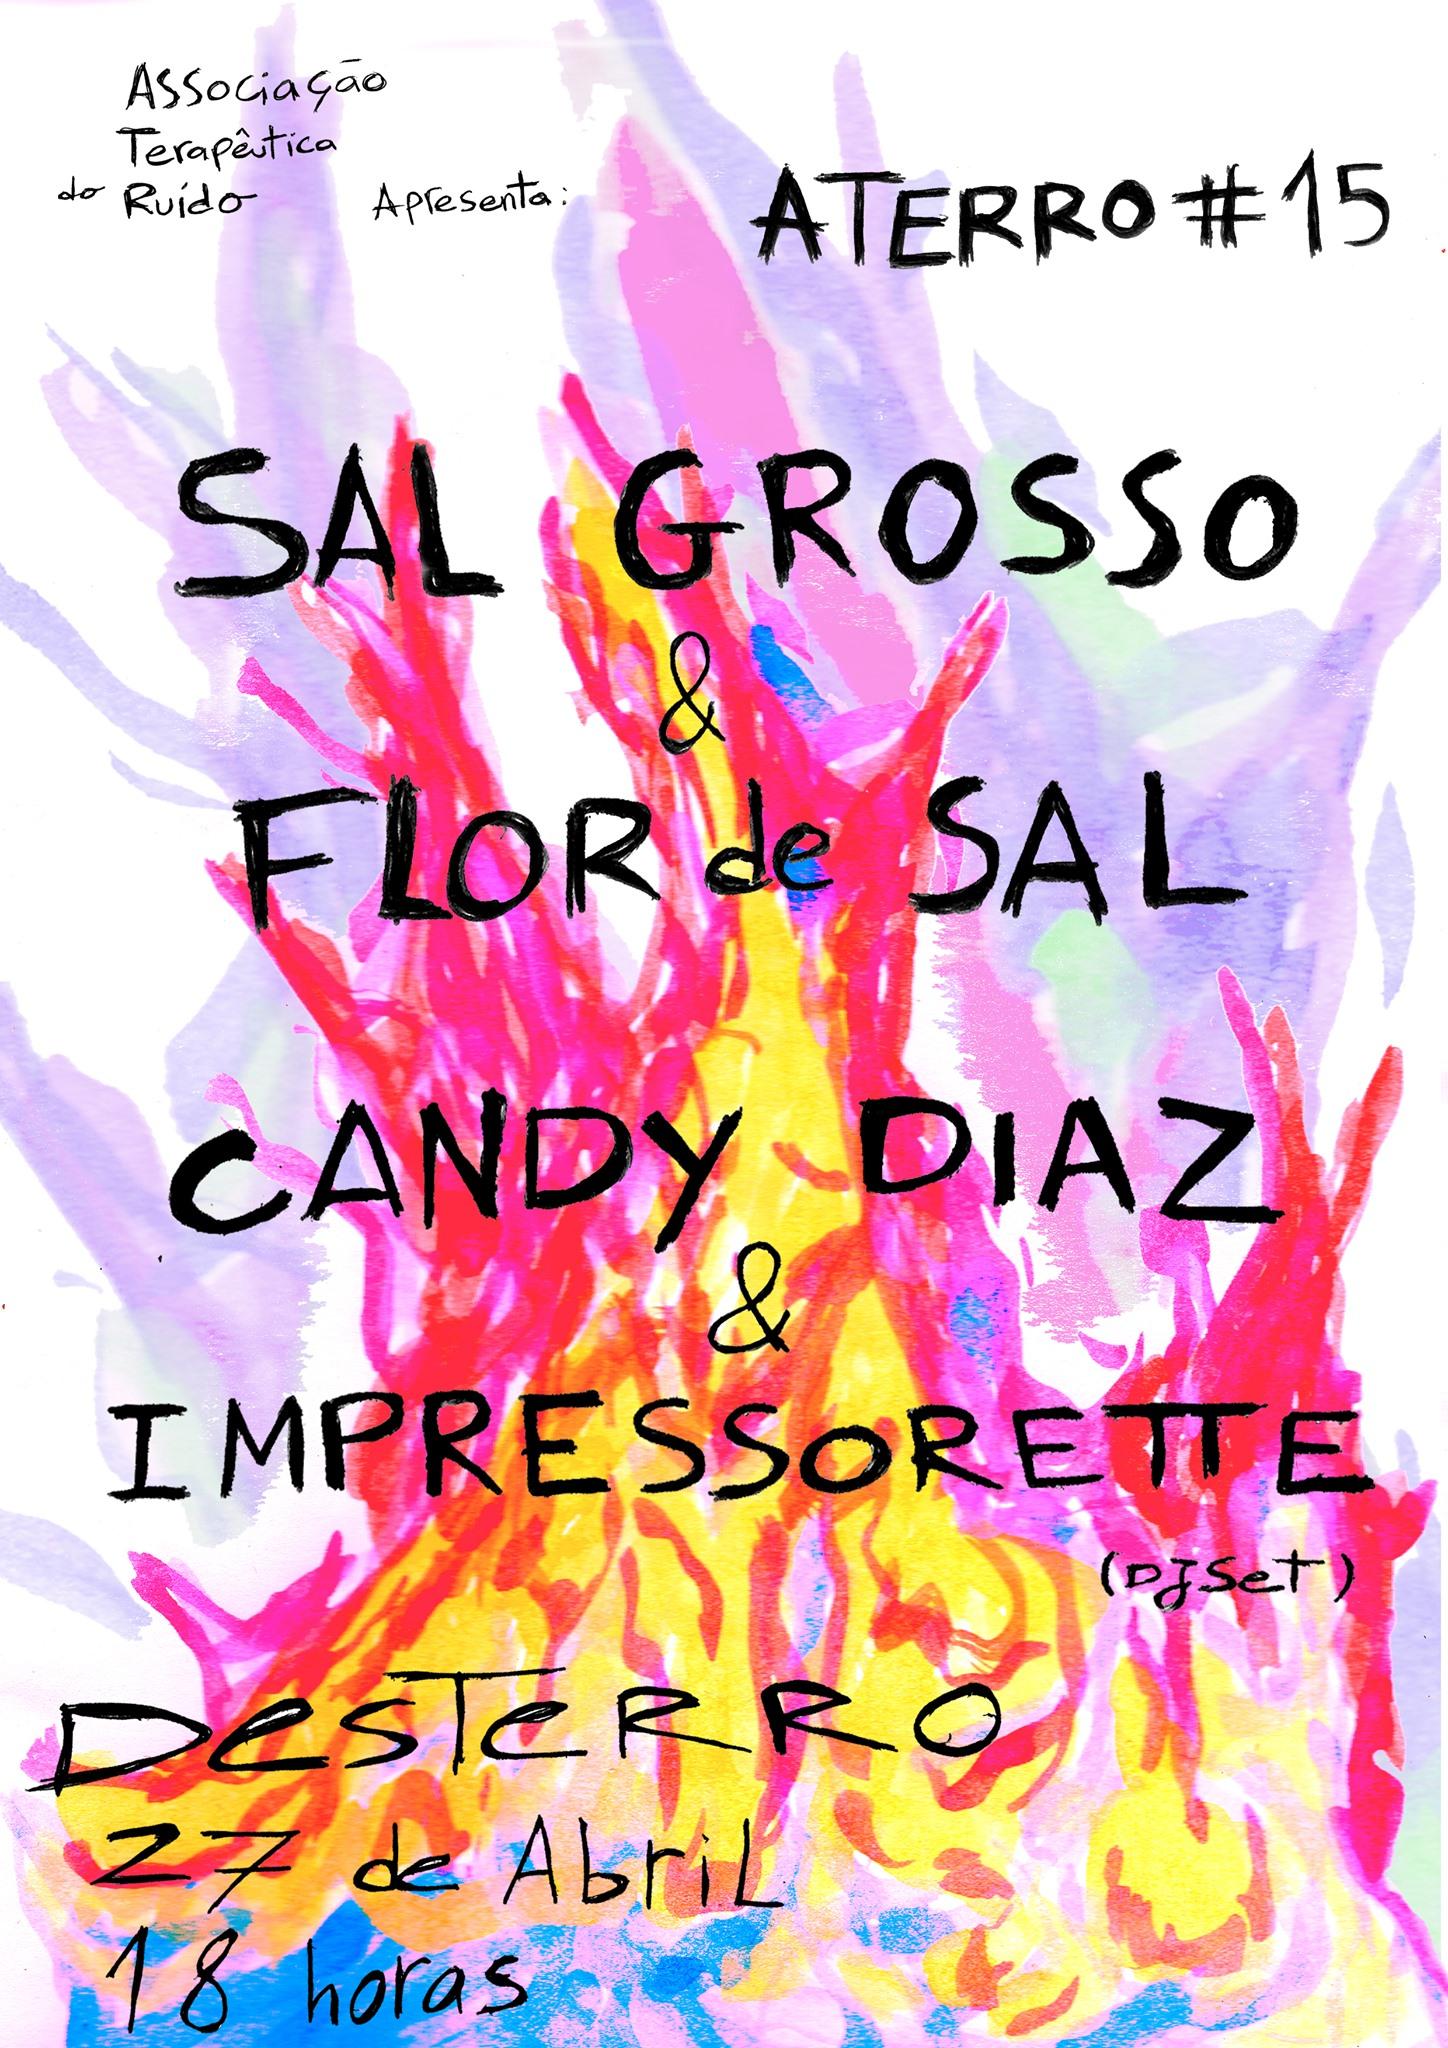 Aterro #15: Sal Grosso & Eyal Talmor + Candy Diaz & Impressorette